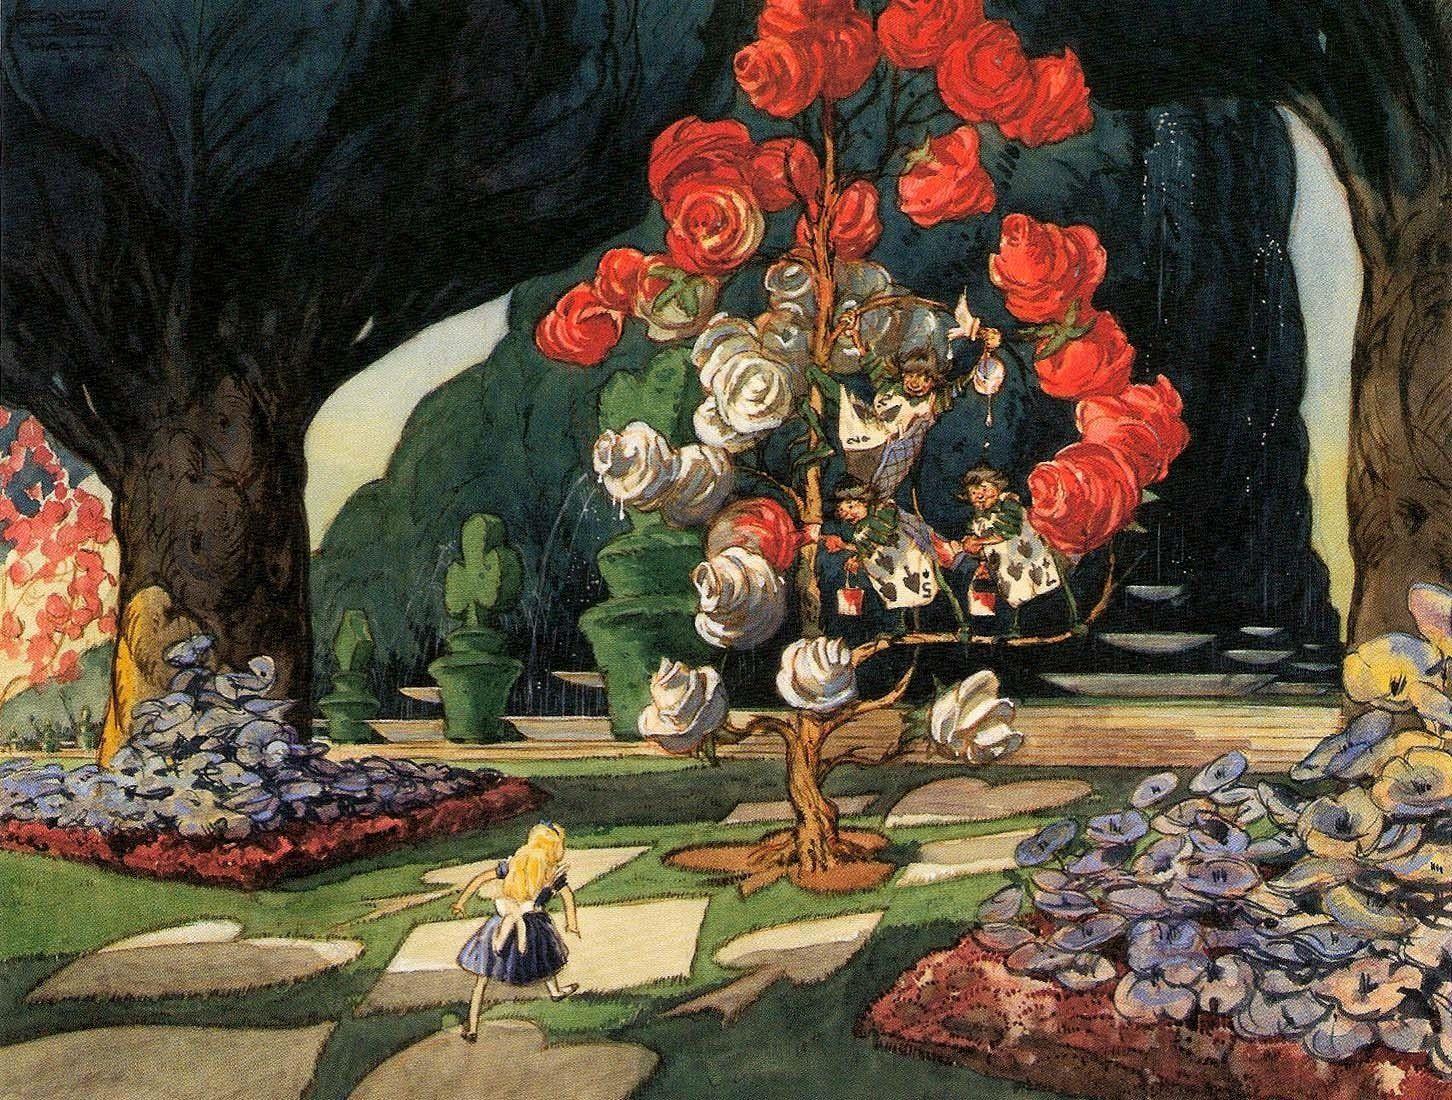 alice in wonderland garden Pesquisa Google Alice in wonderland